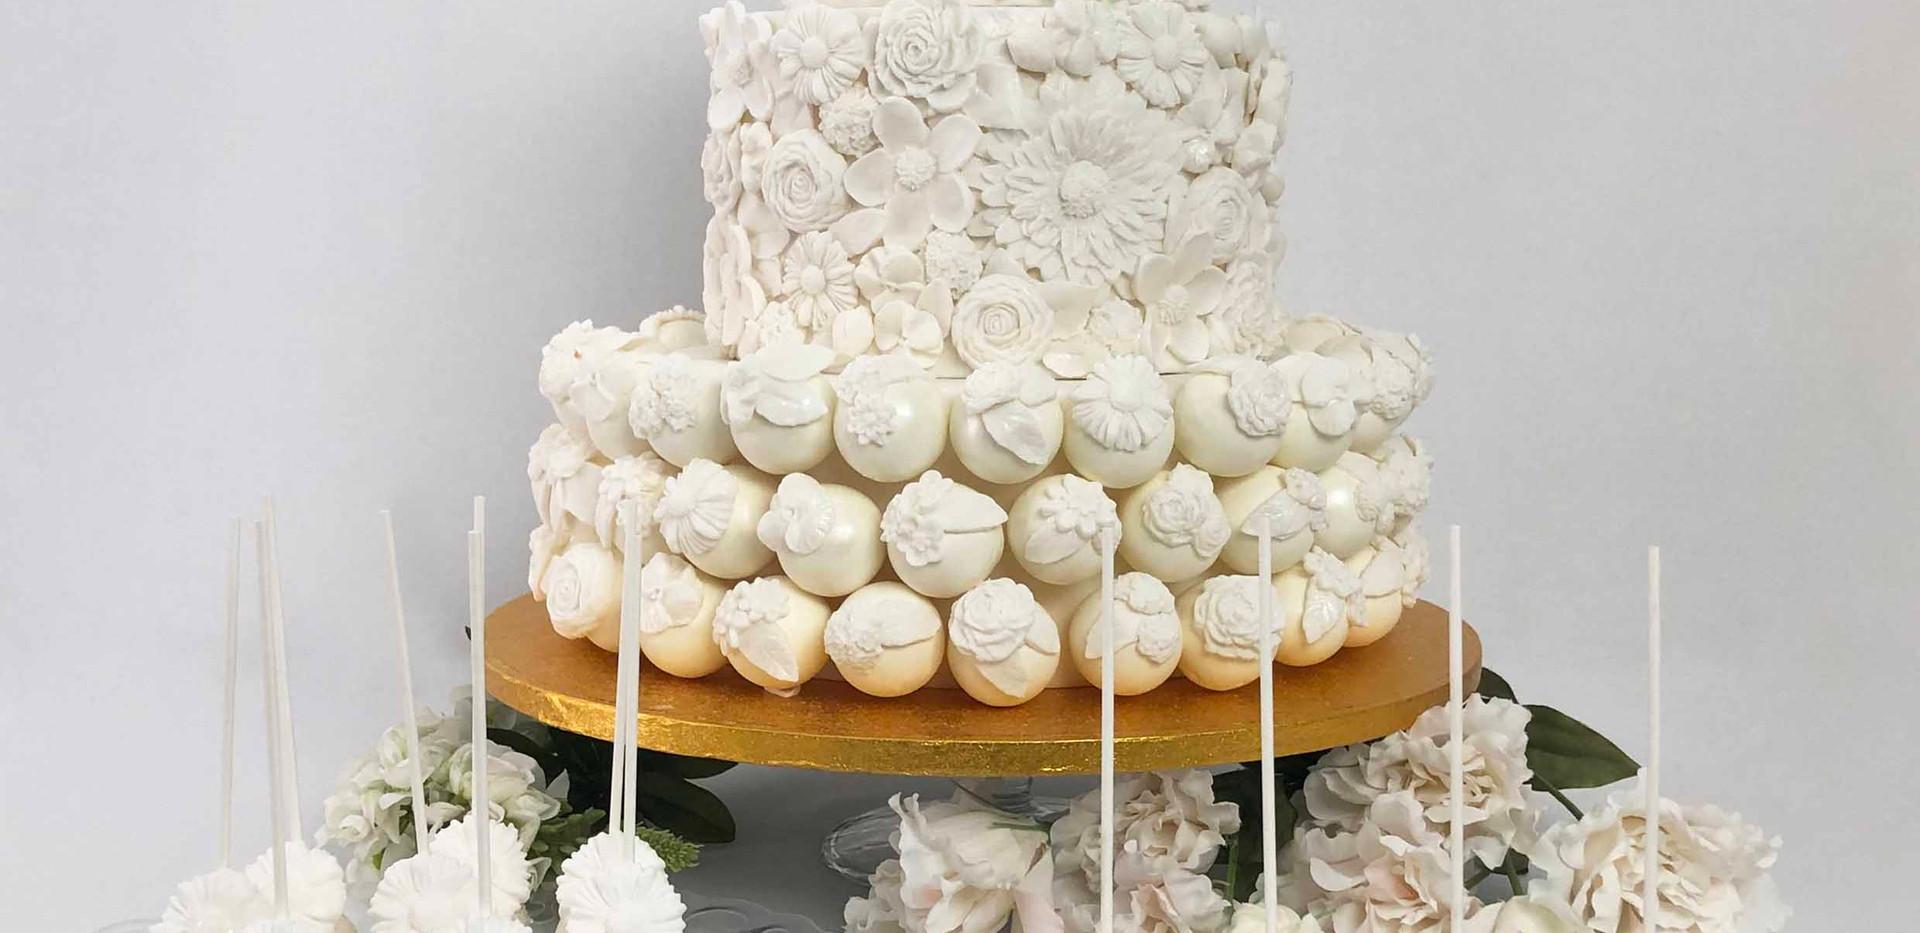 Floral Wedding Cake Image 8 with Logo LR